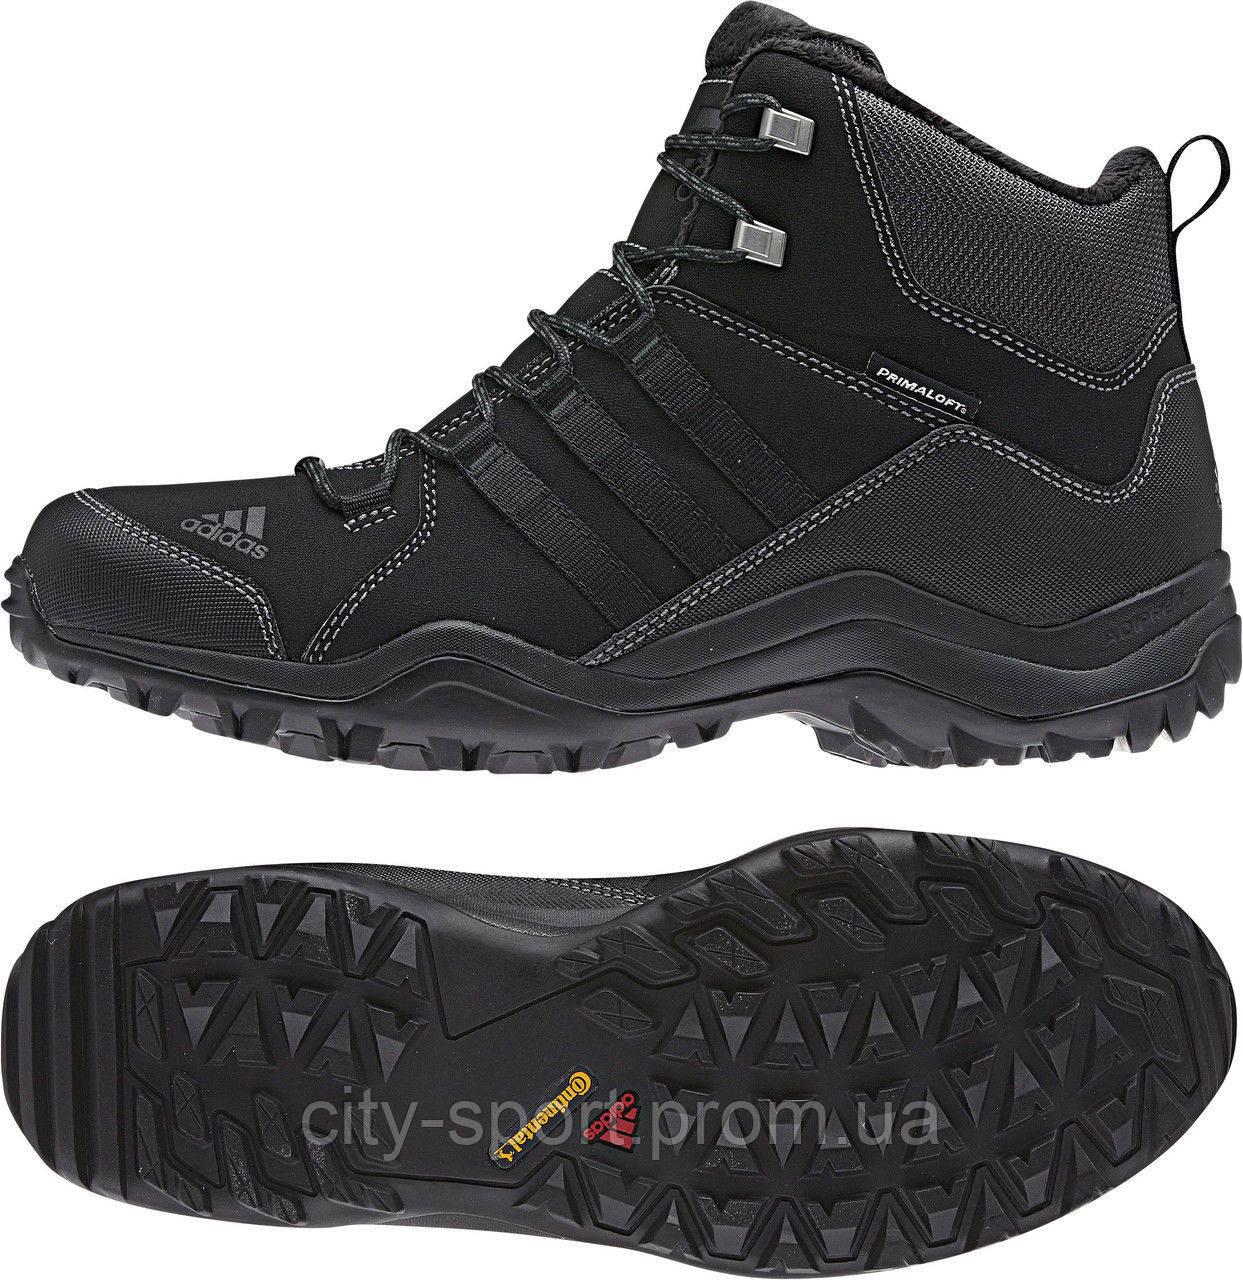 80dee10bb Мужские Ботинки Adidas Winter hiker, Артикул M18836 -